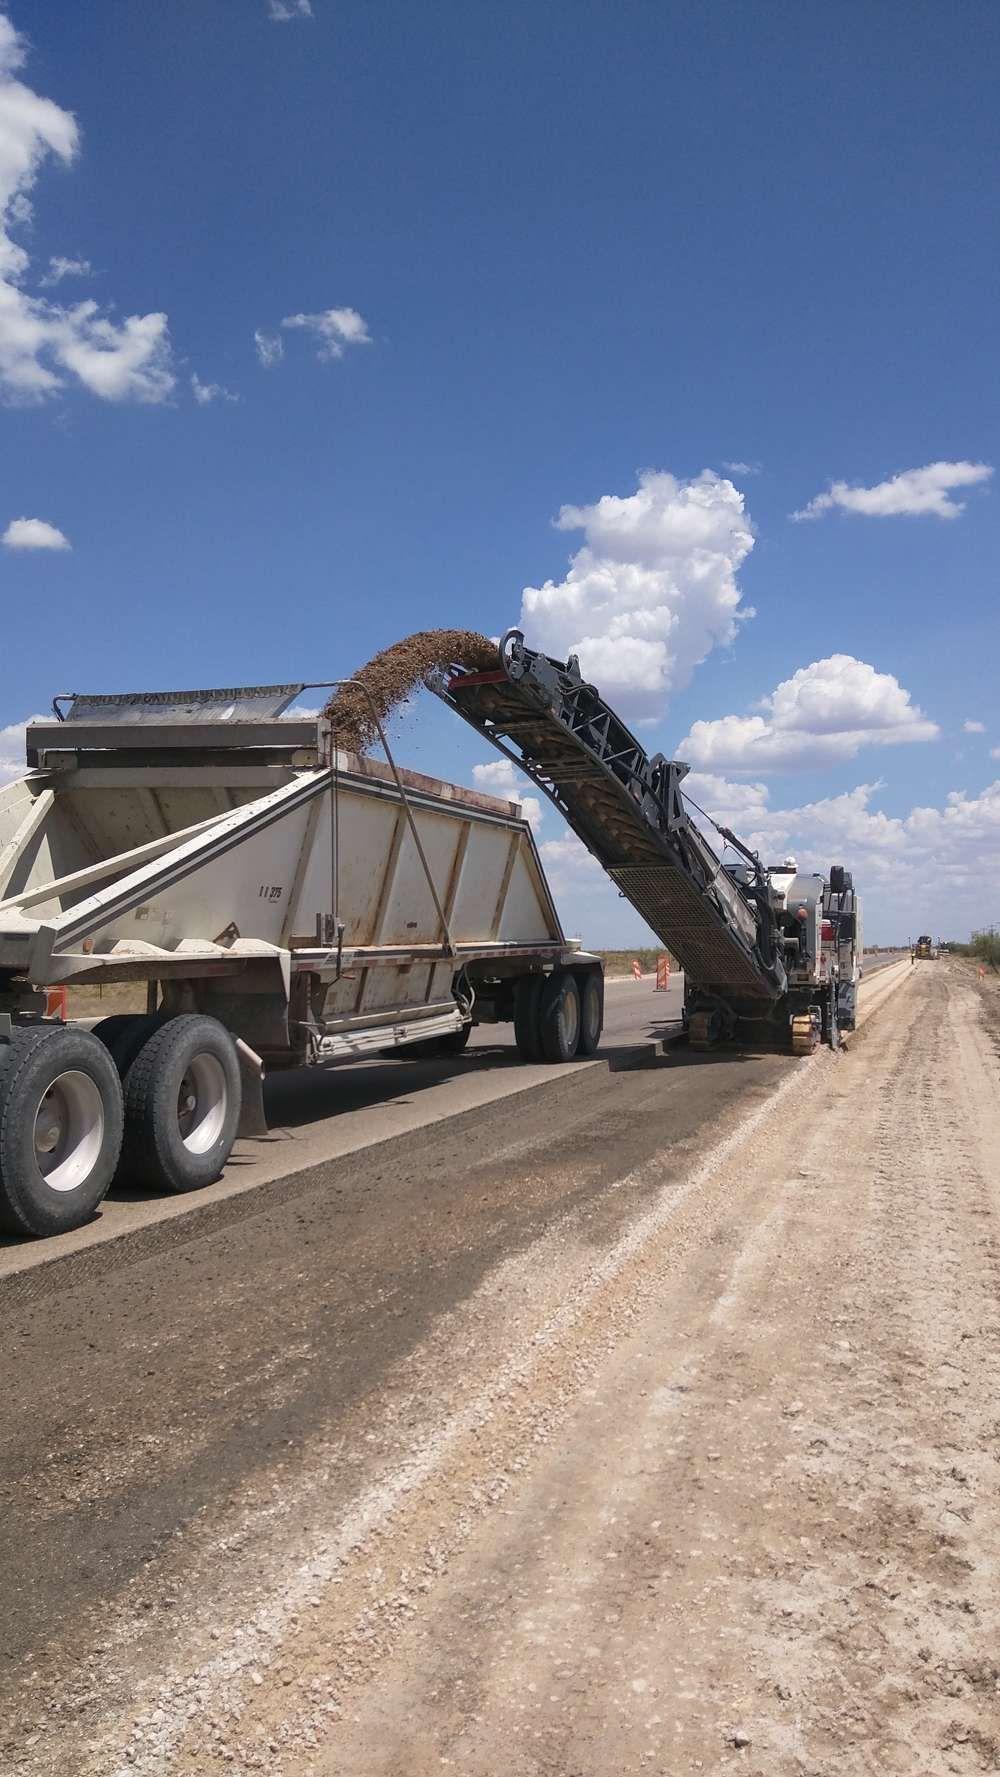 $23M N.M. Road Construction Project Continues Near Hobbs #heavyequipment #construction